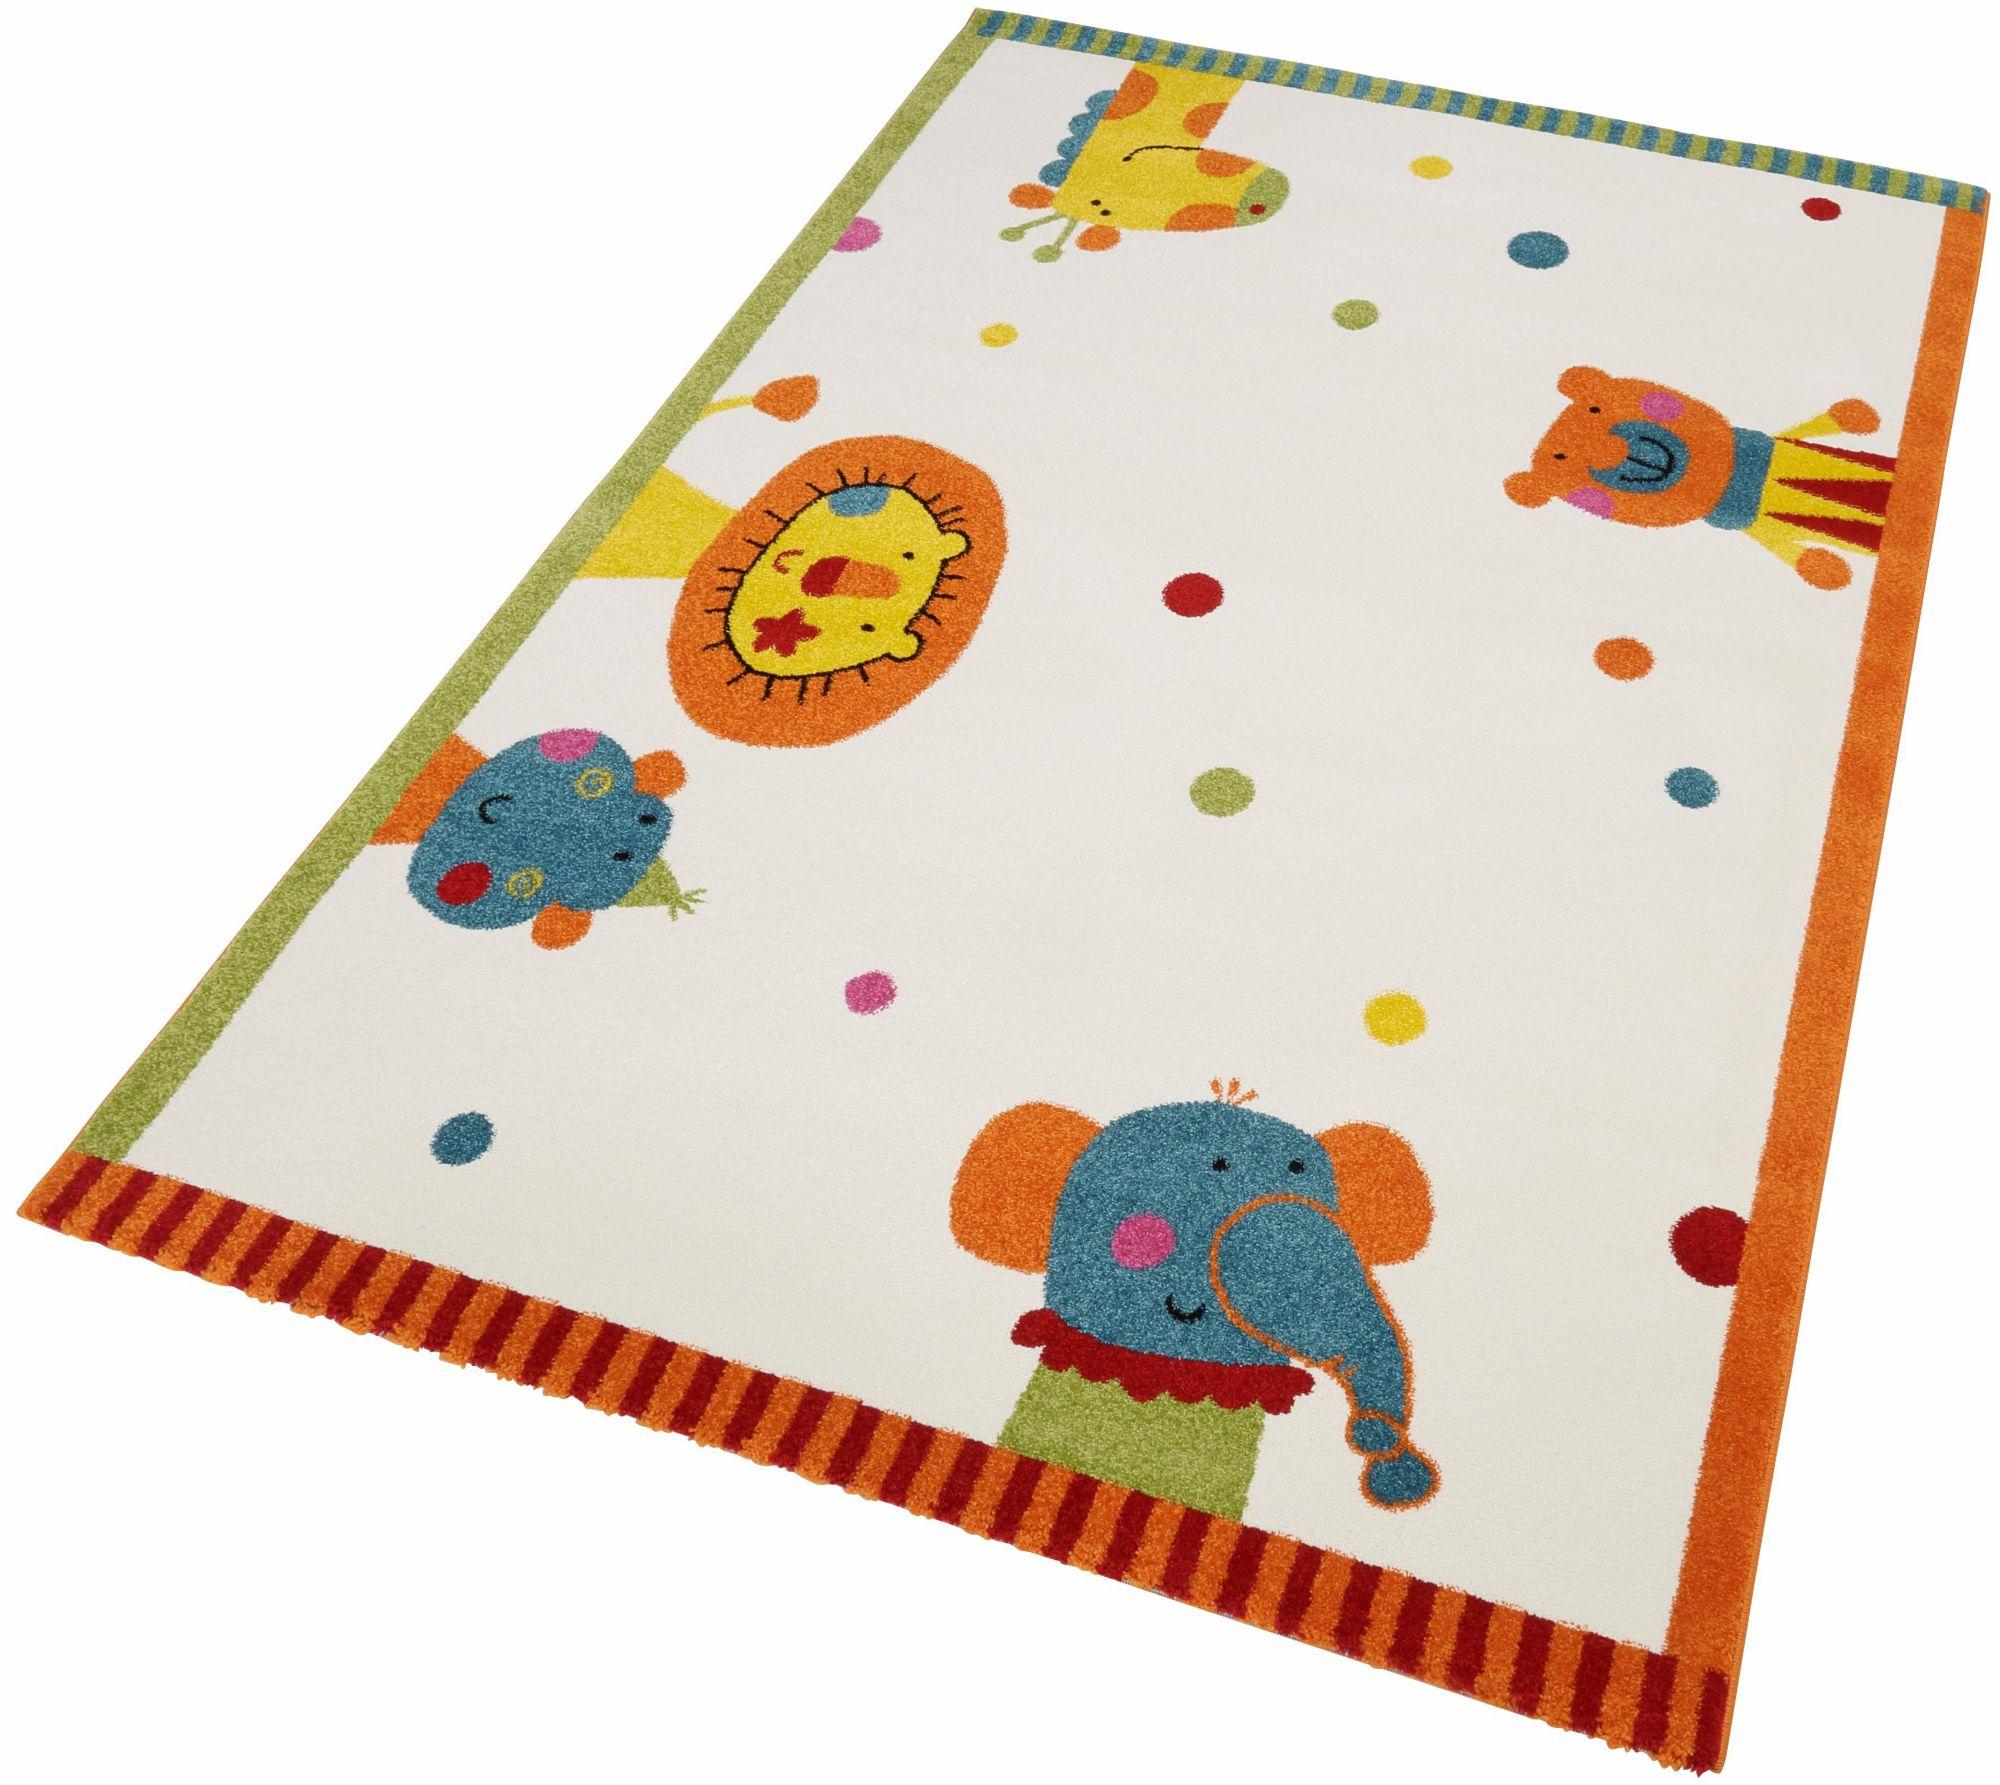 Kinder-Teppich, Sigikid, »Animal Festival«, gewebt